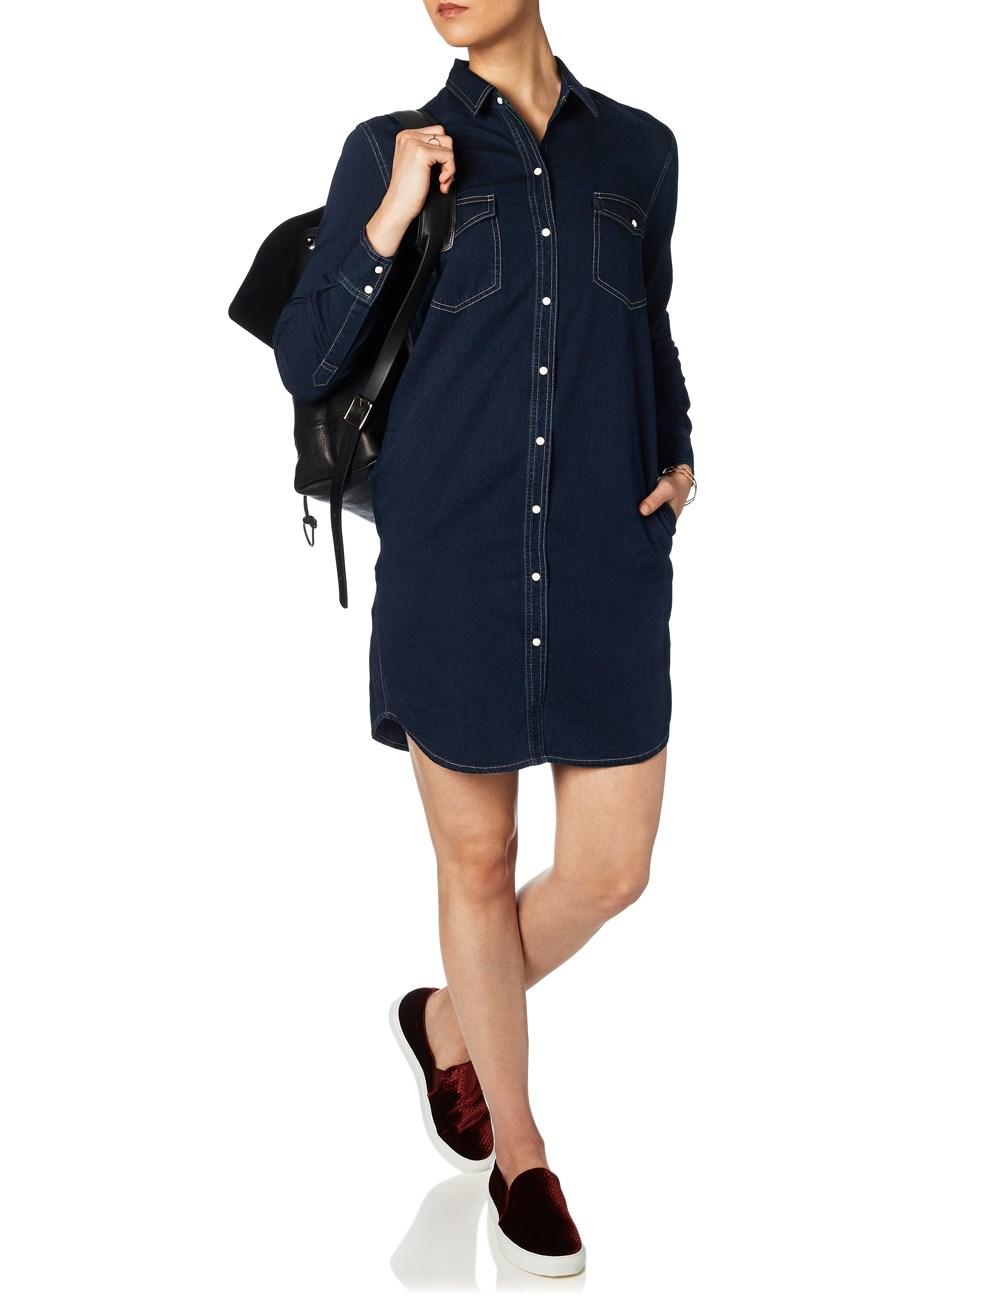 M I H Jeans Indigo Denim Button Shirt Dress In Blue Lyst